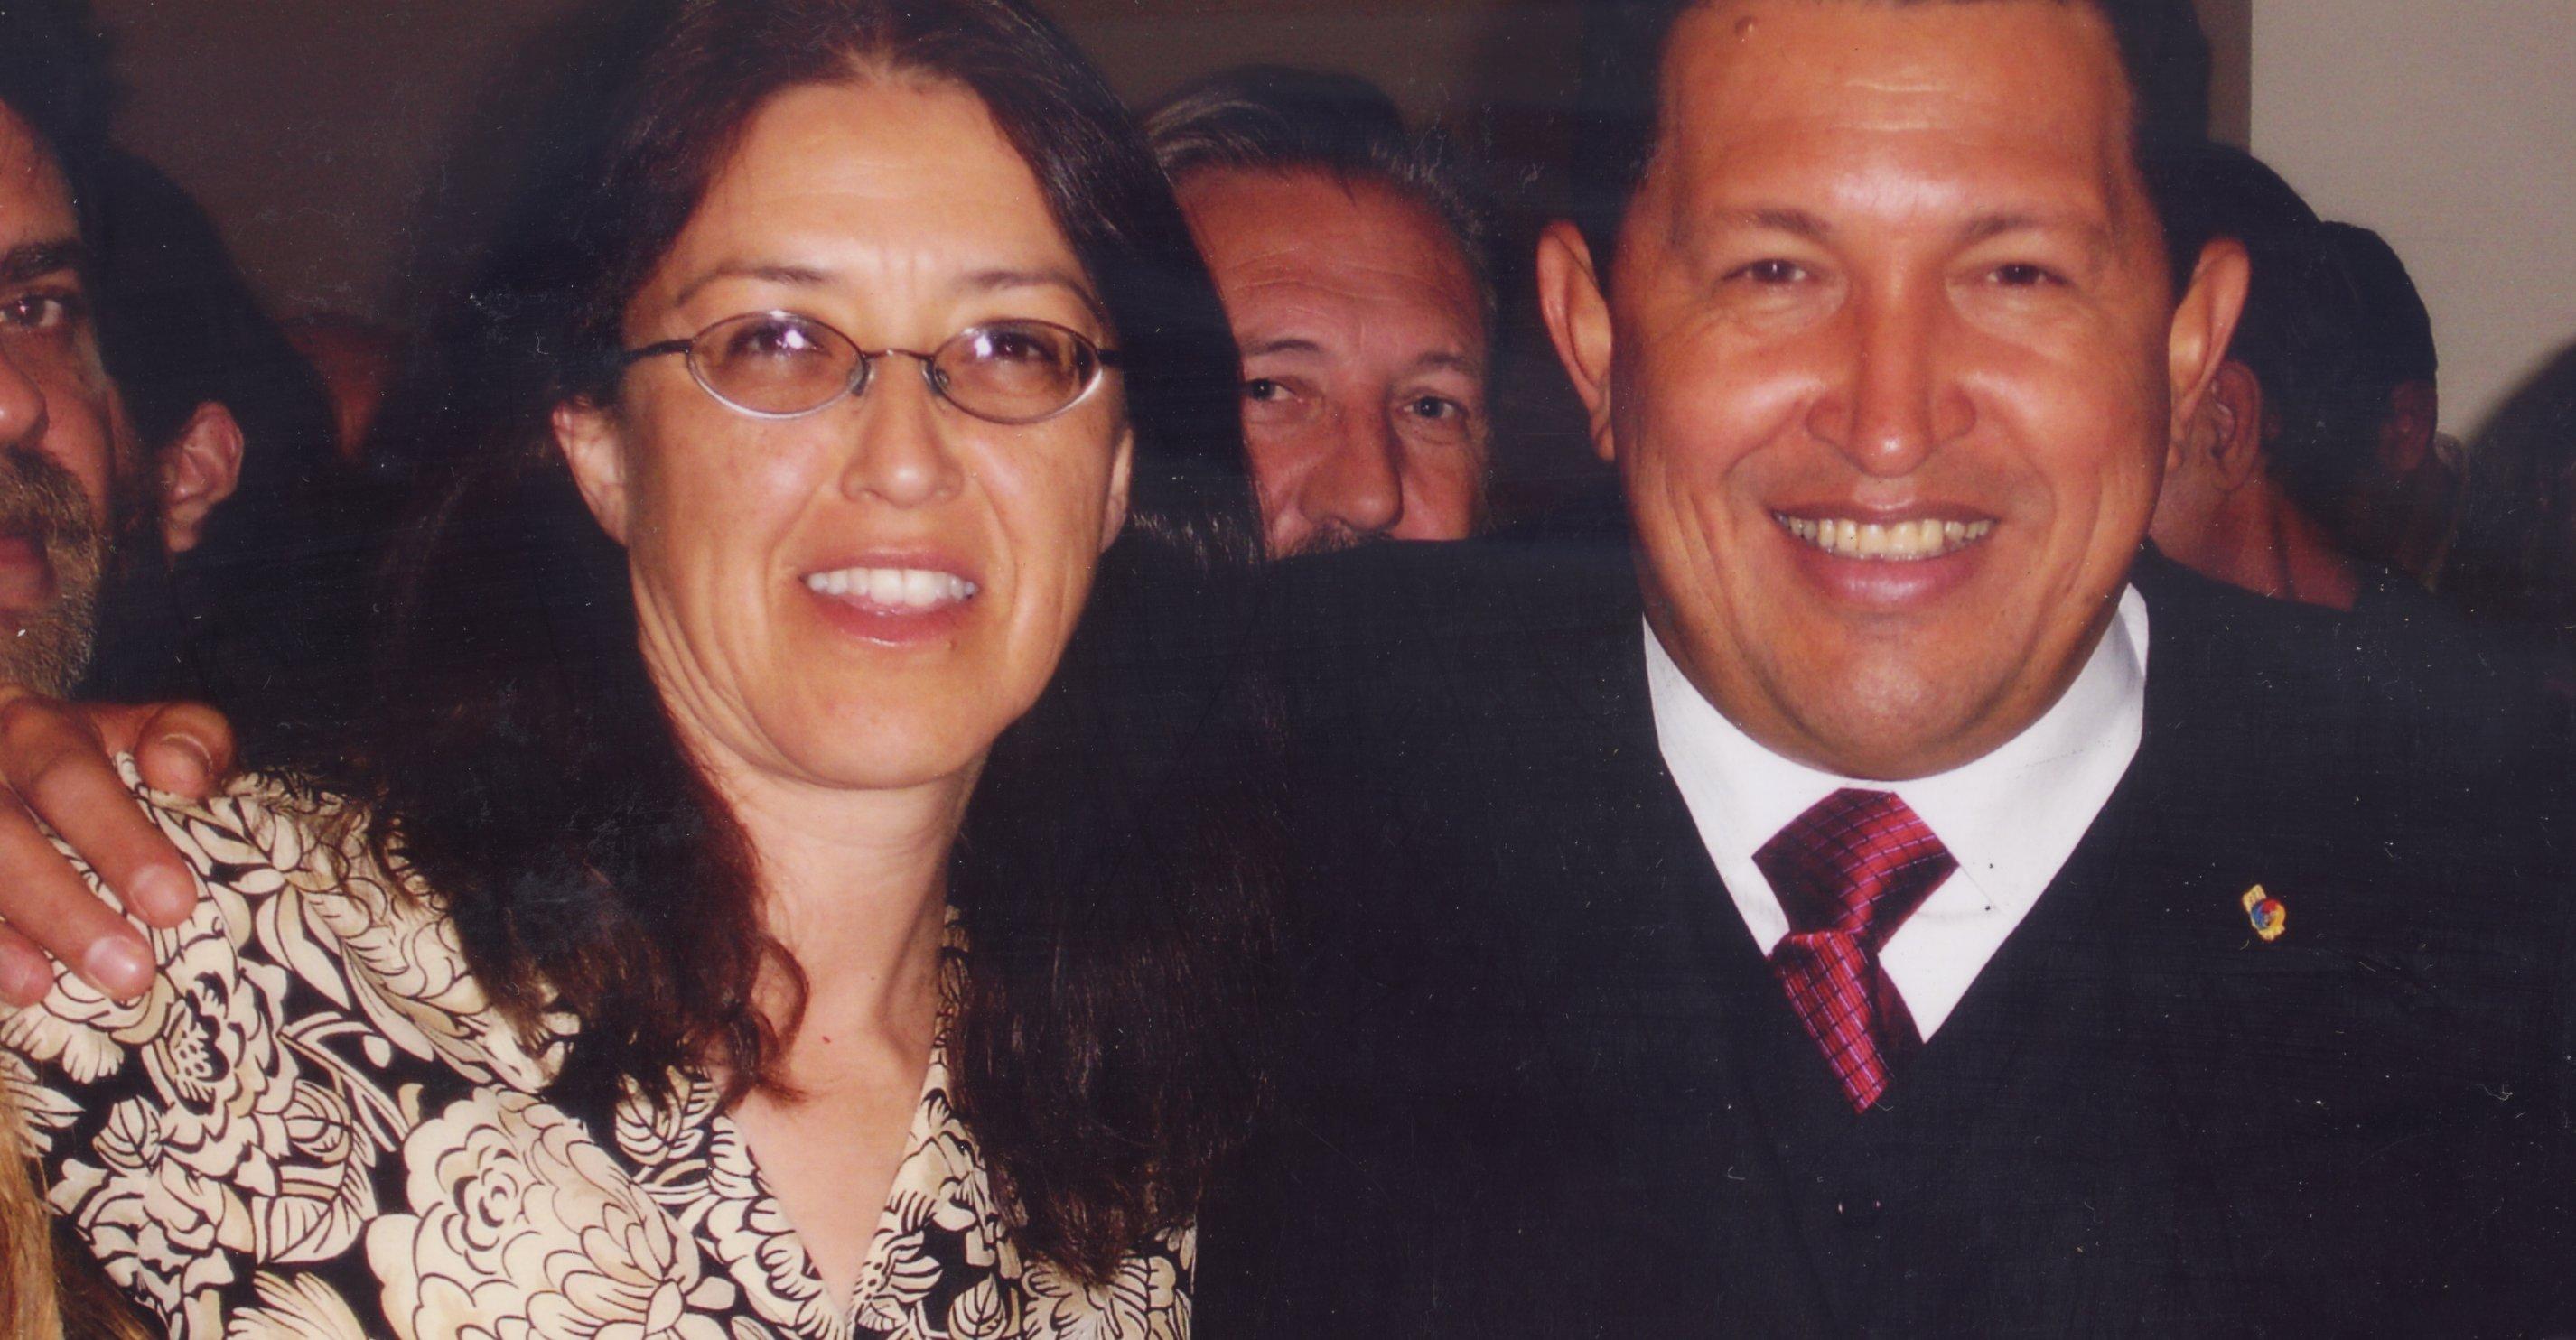 GLR_Chavez_Mar_del_Plata_2005.jpg